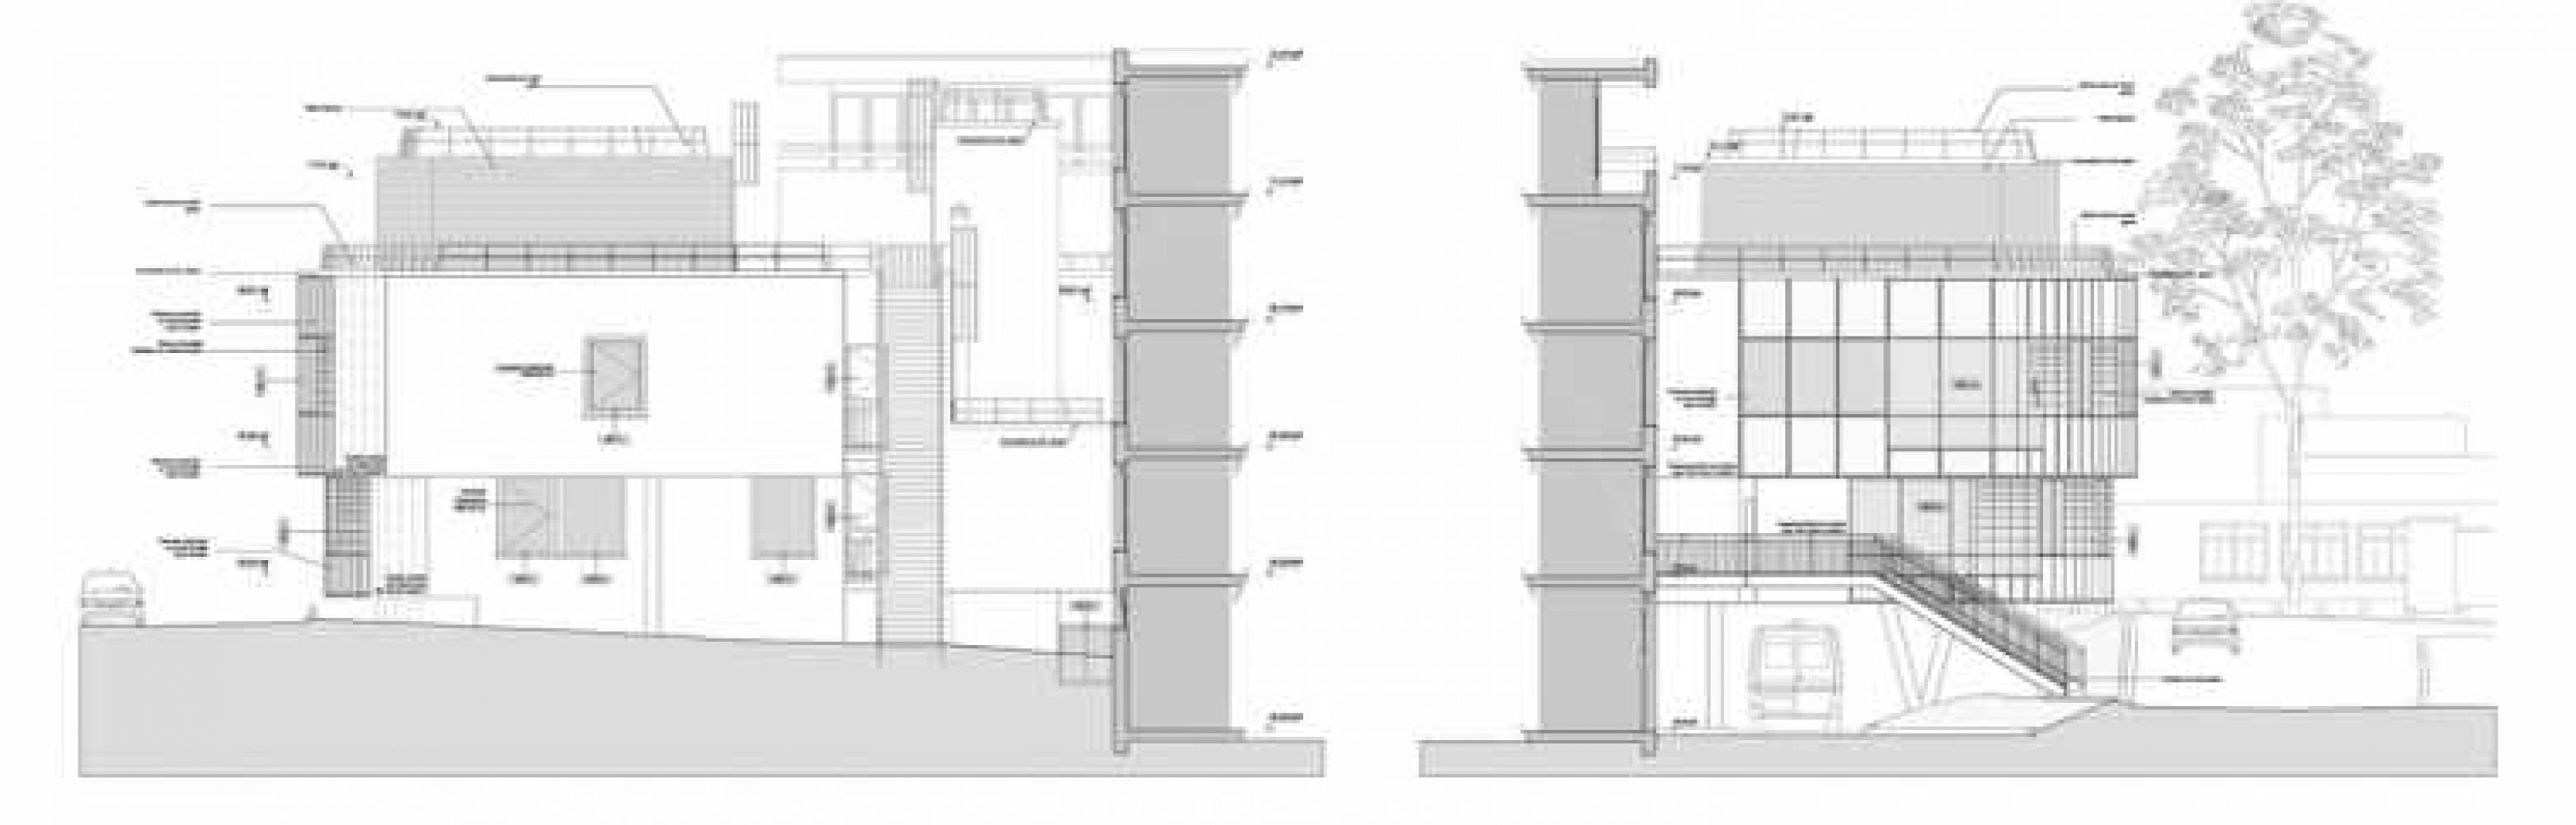 zlag_redim02 Pascale SEURIN Architecte - Pascale SEURIN Architecte